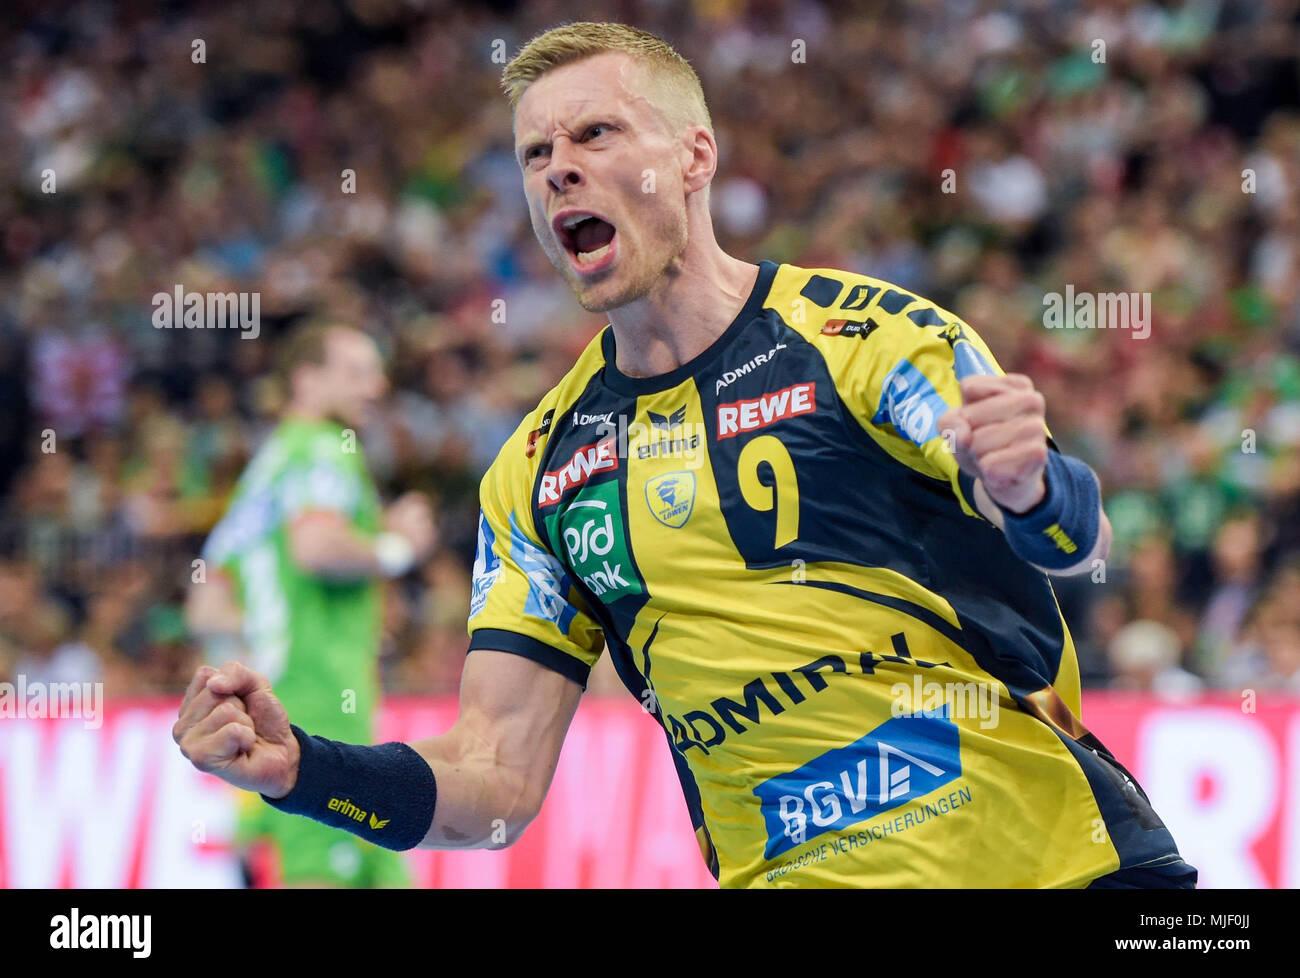 05 May 2018, Germany, Hamburg: Handball: DHB-Pokal, SC Magdeburg vs Rhine-Neckar Lions at the Barclaycard Arena: Rhine's Gudjon Valur Sigurdsson. Photo: Axel Heimken/dpa - Stock Image